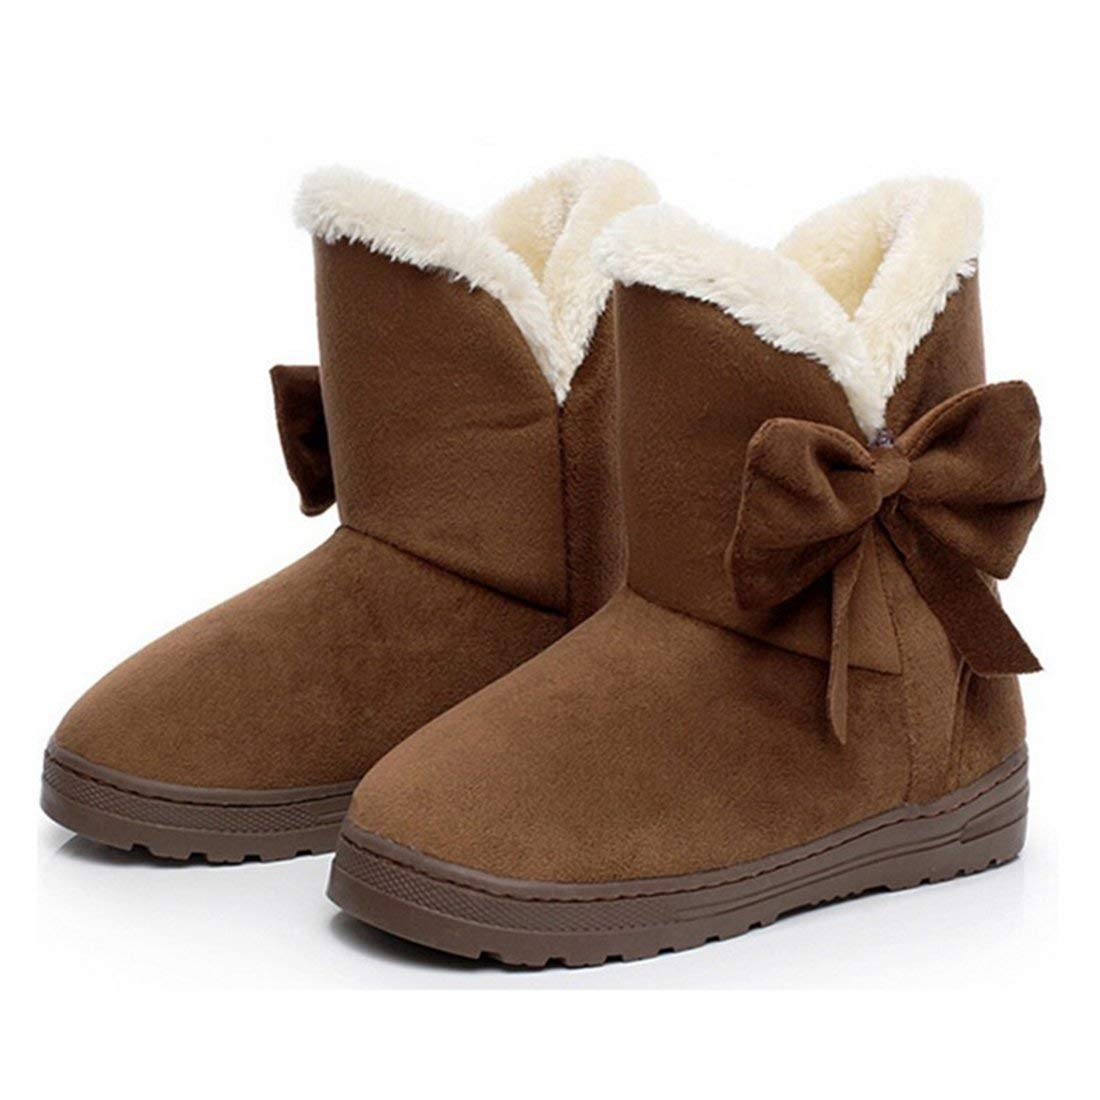 HUAIX HUAIX HUAIX Home Damen Winterstiefel Flats Slip Stiefel Klassische Stiefeletten Elegante Bow Decration Winter Pelzstiefel (Farbe   Coffee, Größe   EU 37-38) d30bf5